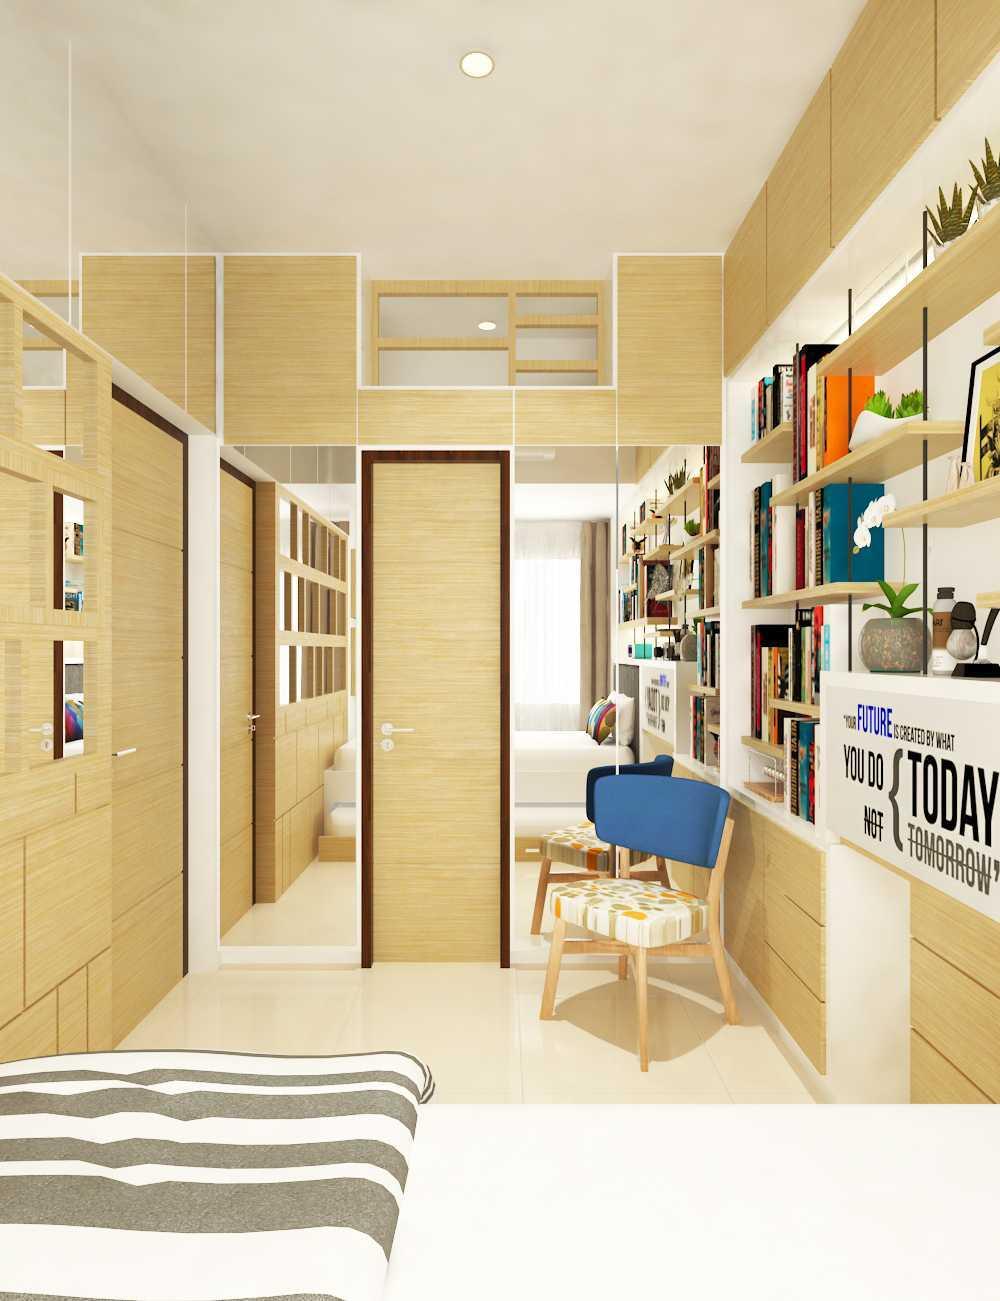 Miv Architects (Ar. Muhammad Ikhsan Hamiru, Iai & Partners) Interior Design Of Apartment Unit Makassar, South Sulawesi, Indonesia Makassar, South Sulawesi, Indonesia Apartment Room Design Skandinavia  29134